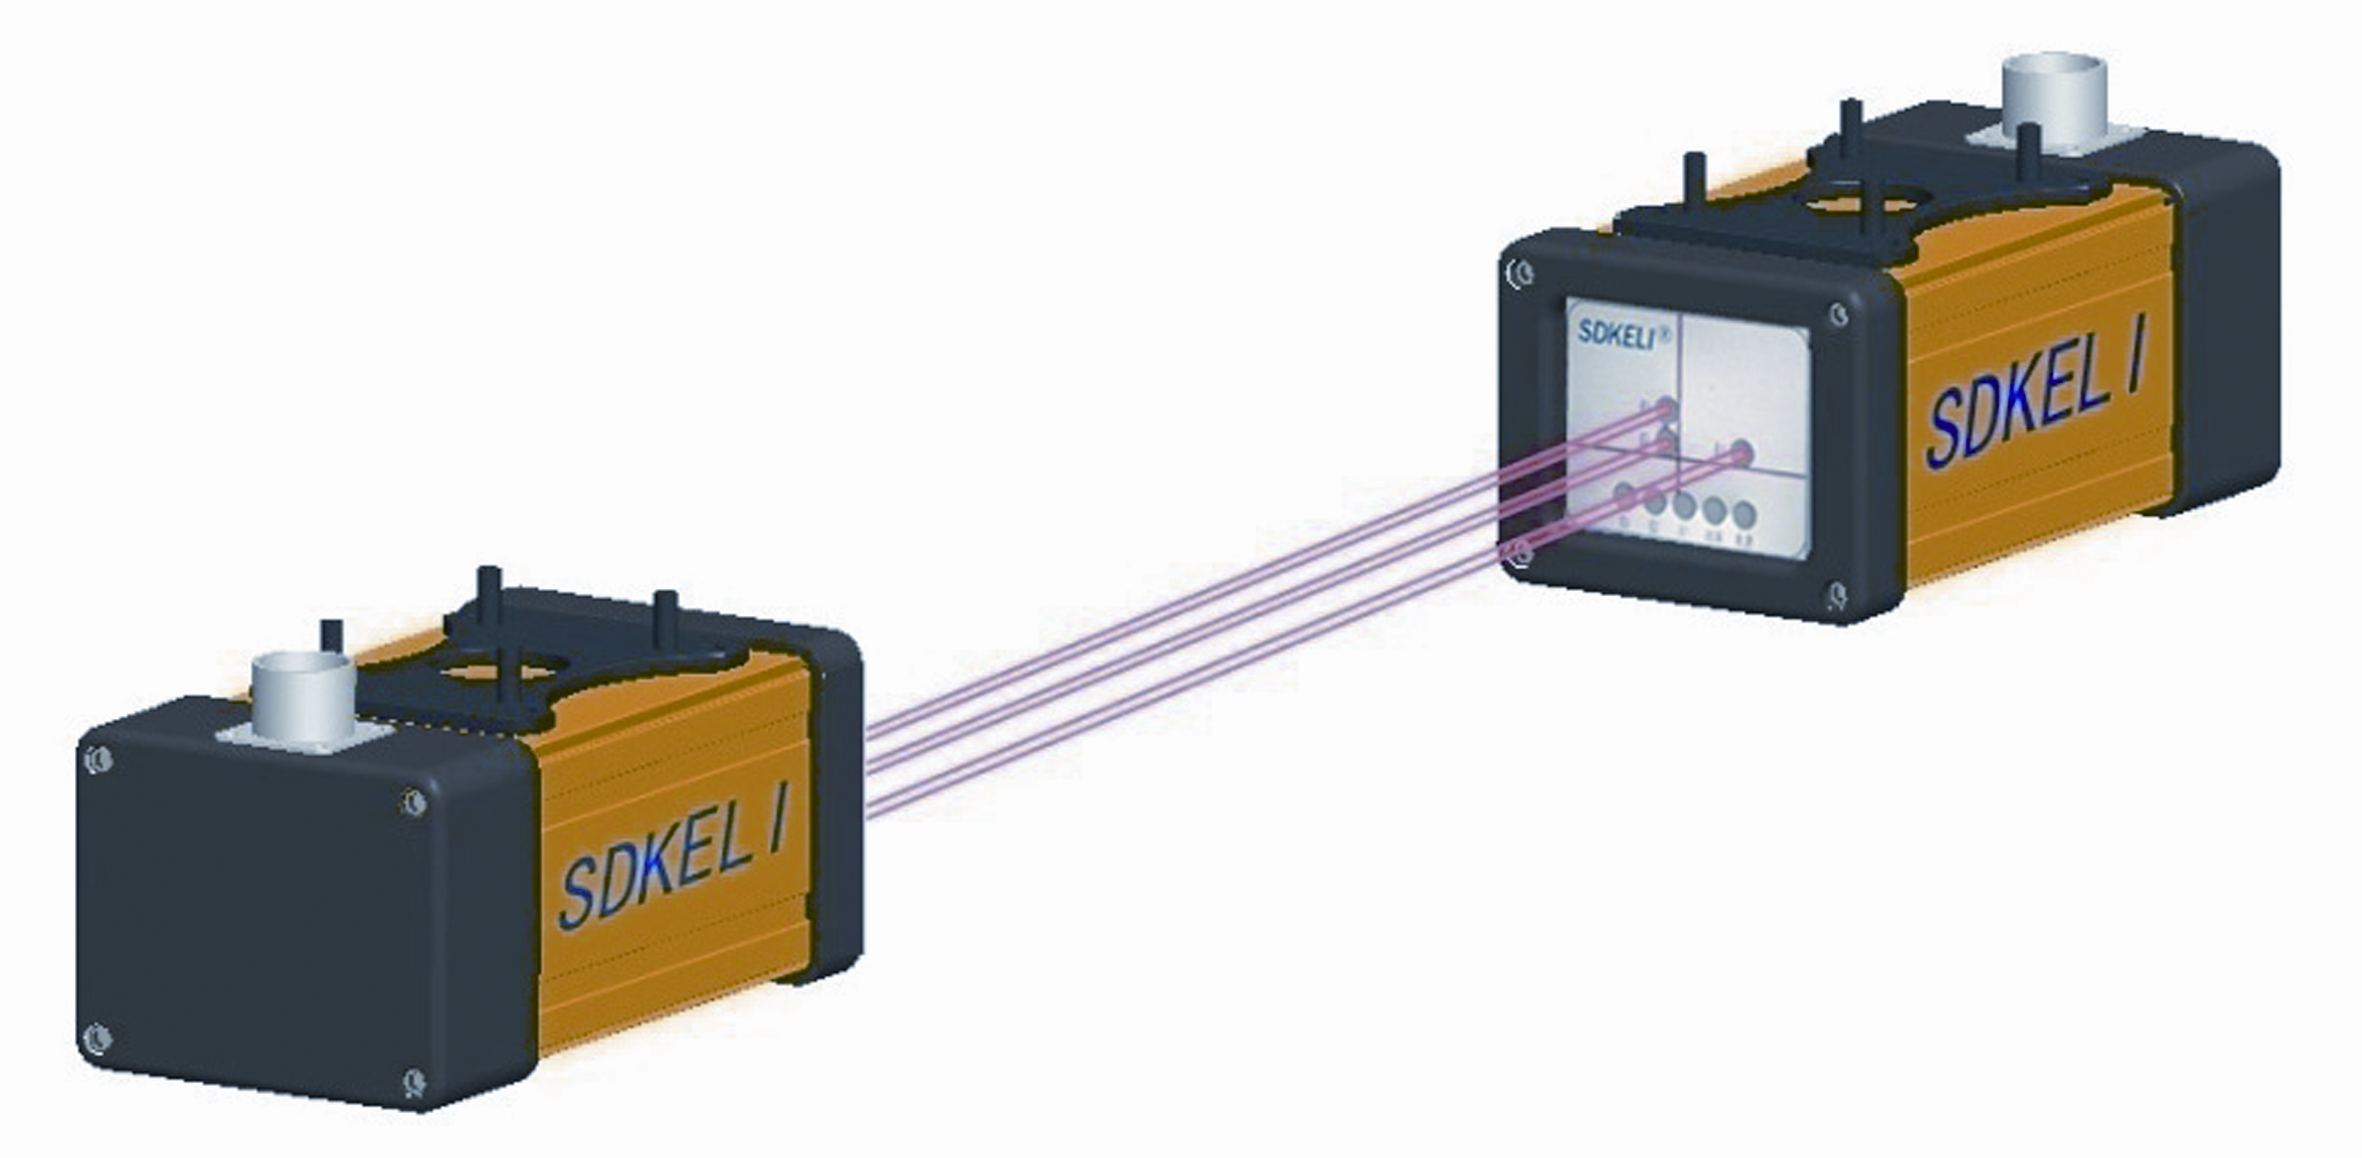 Sdkeli Blps Laser Safety System Press Brake Bending